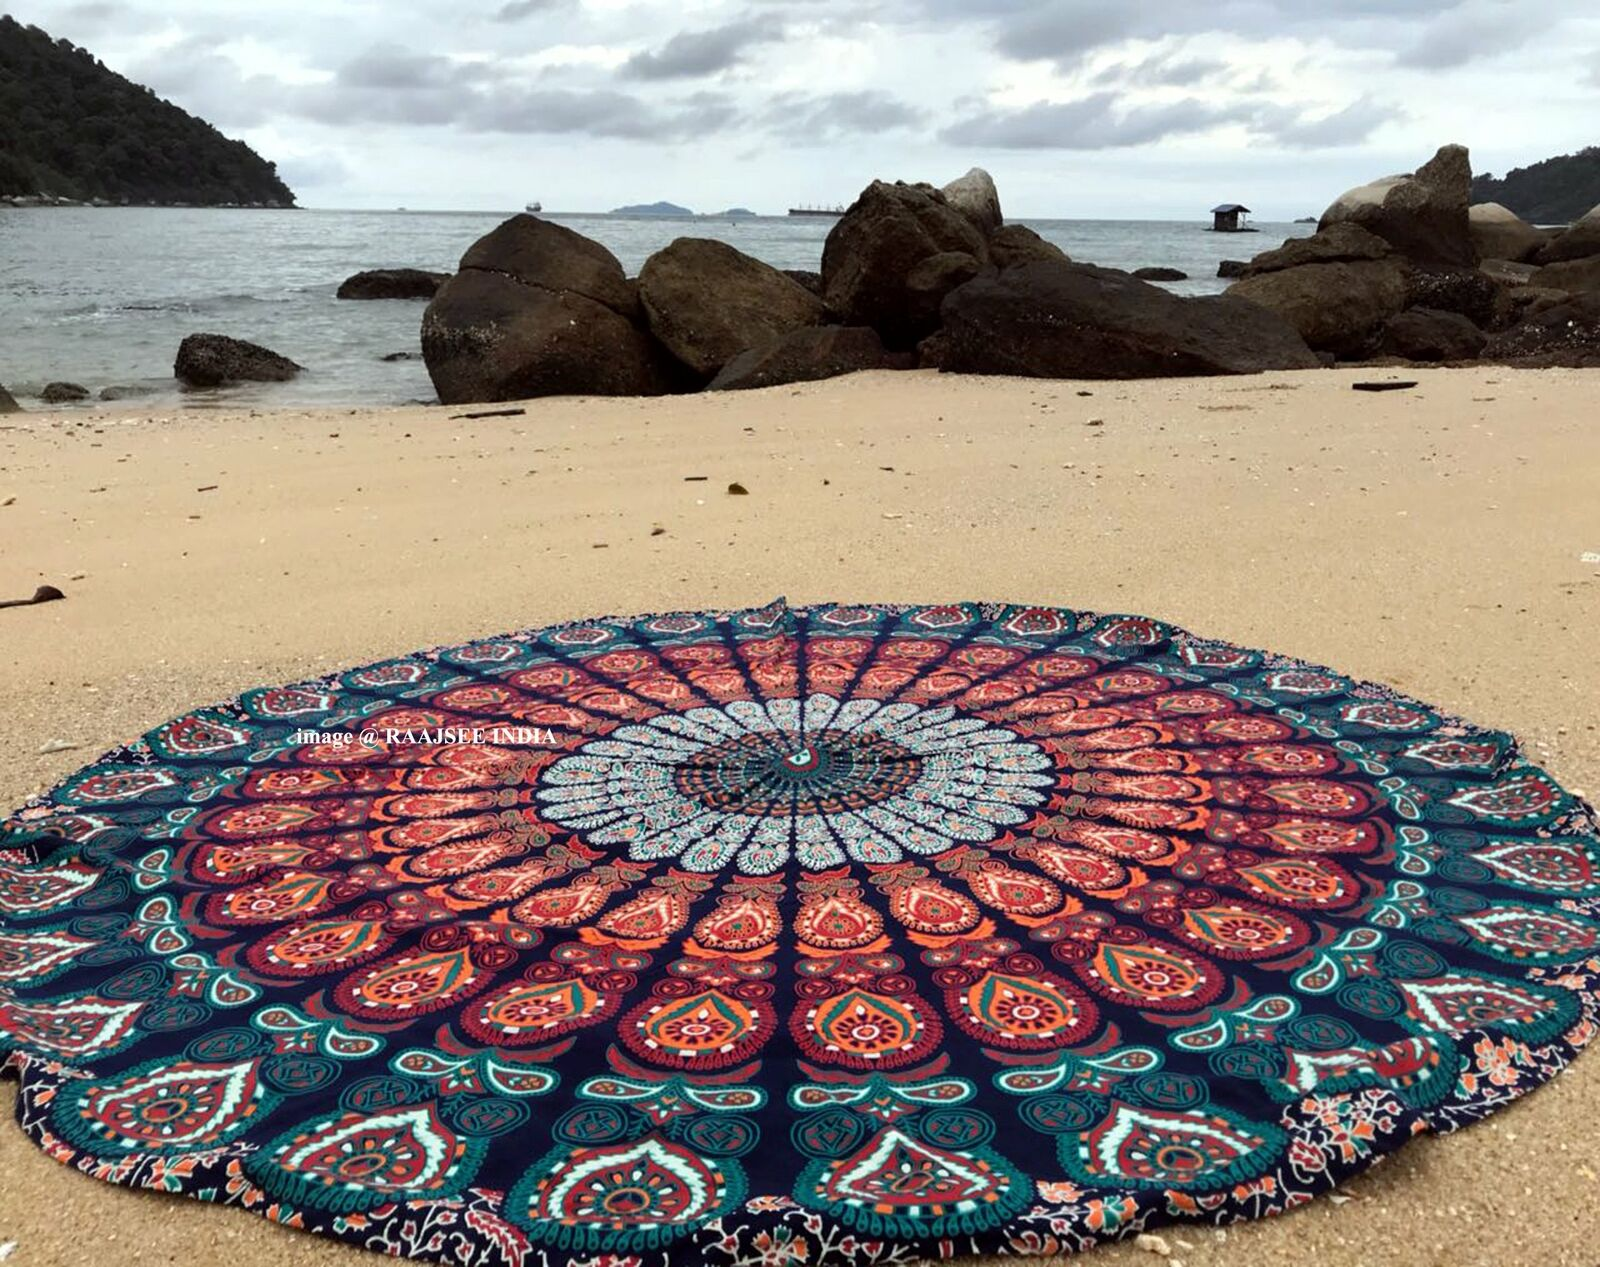 Boho Mandala Round Towel Tapestry Picnic Blanket Yoga Mats AU OTIME Beach Throw